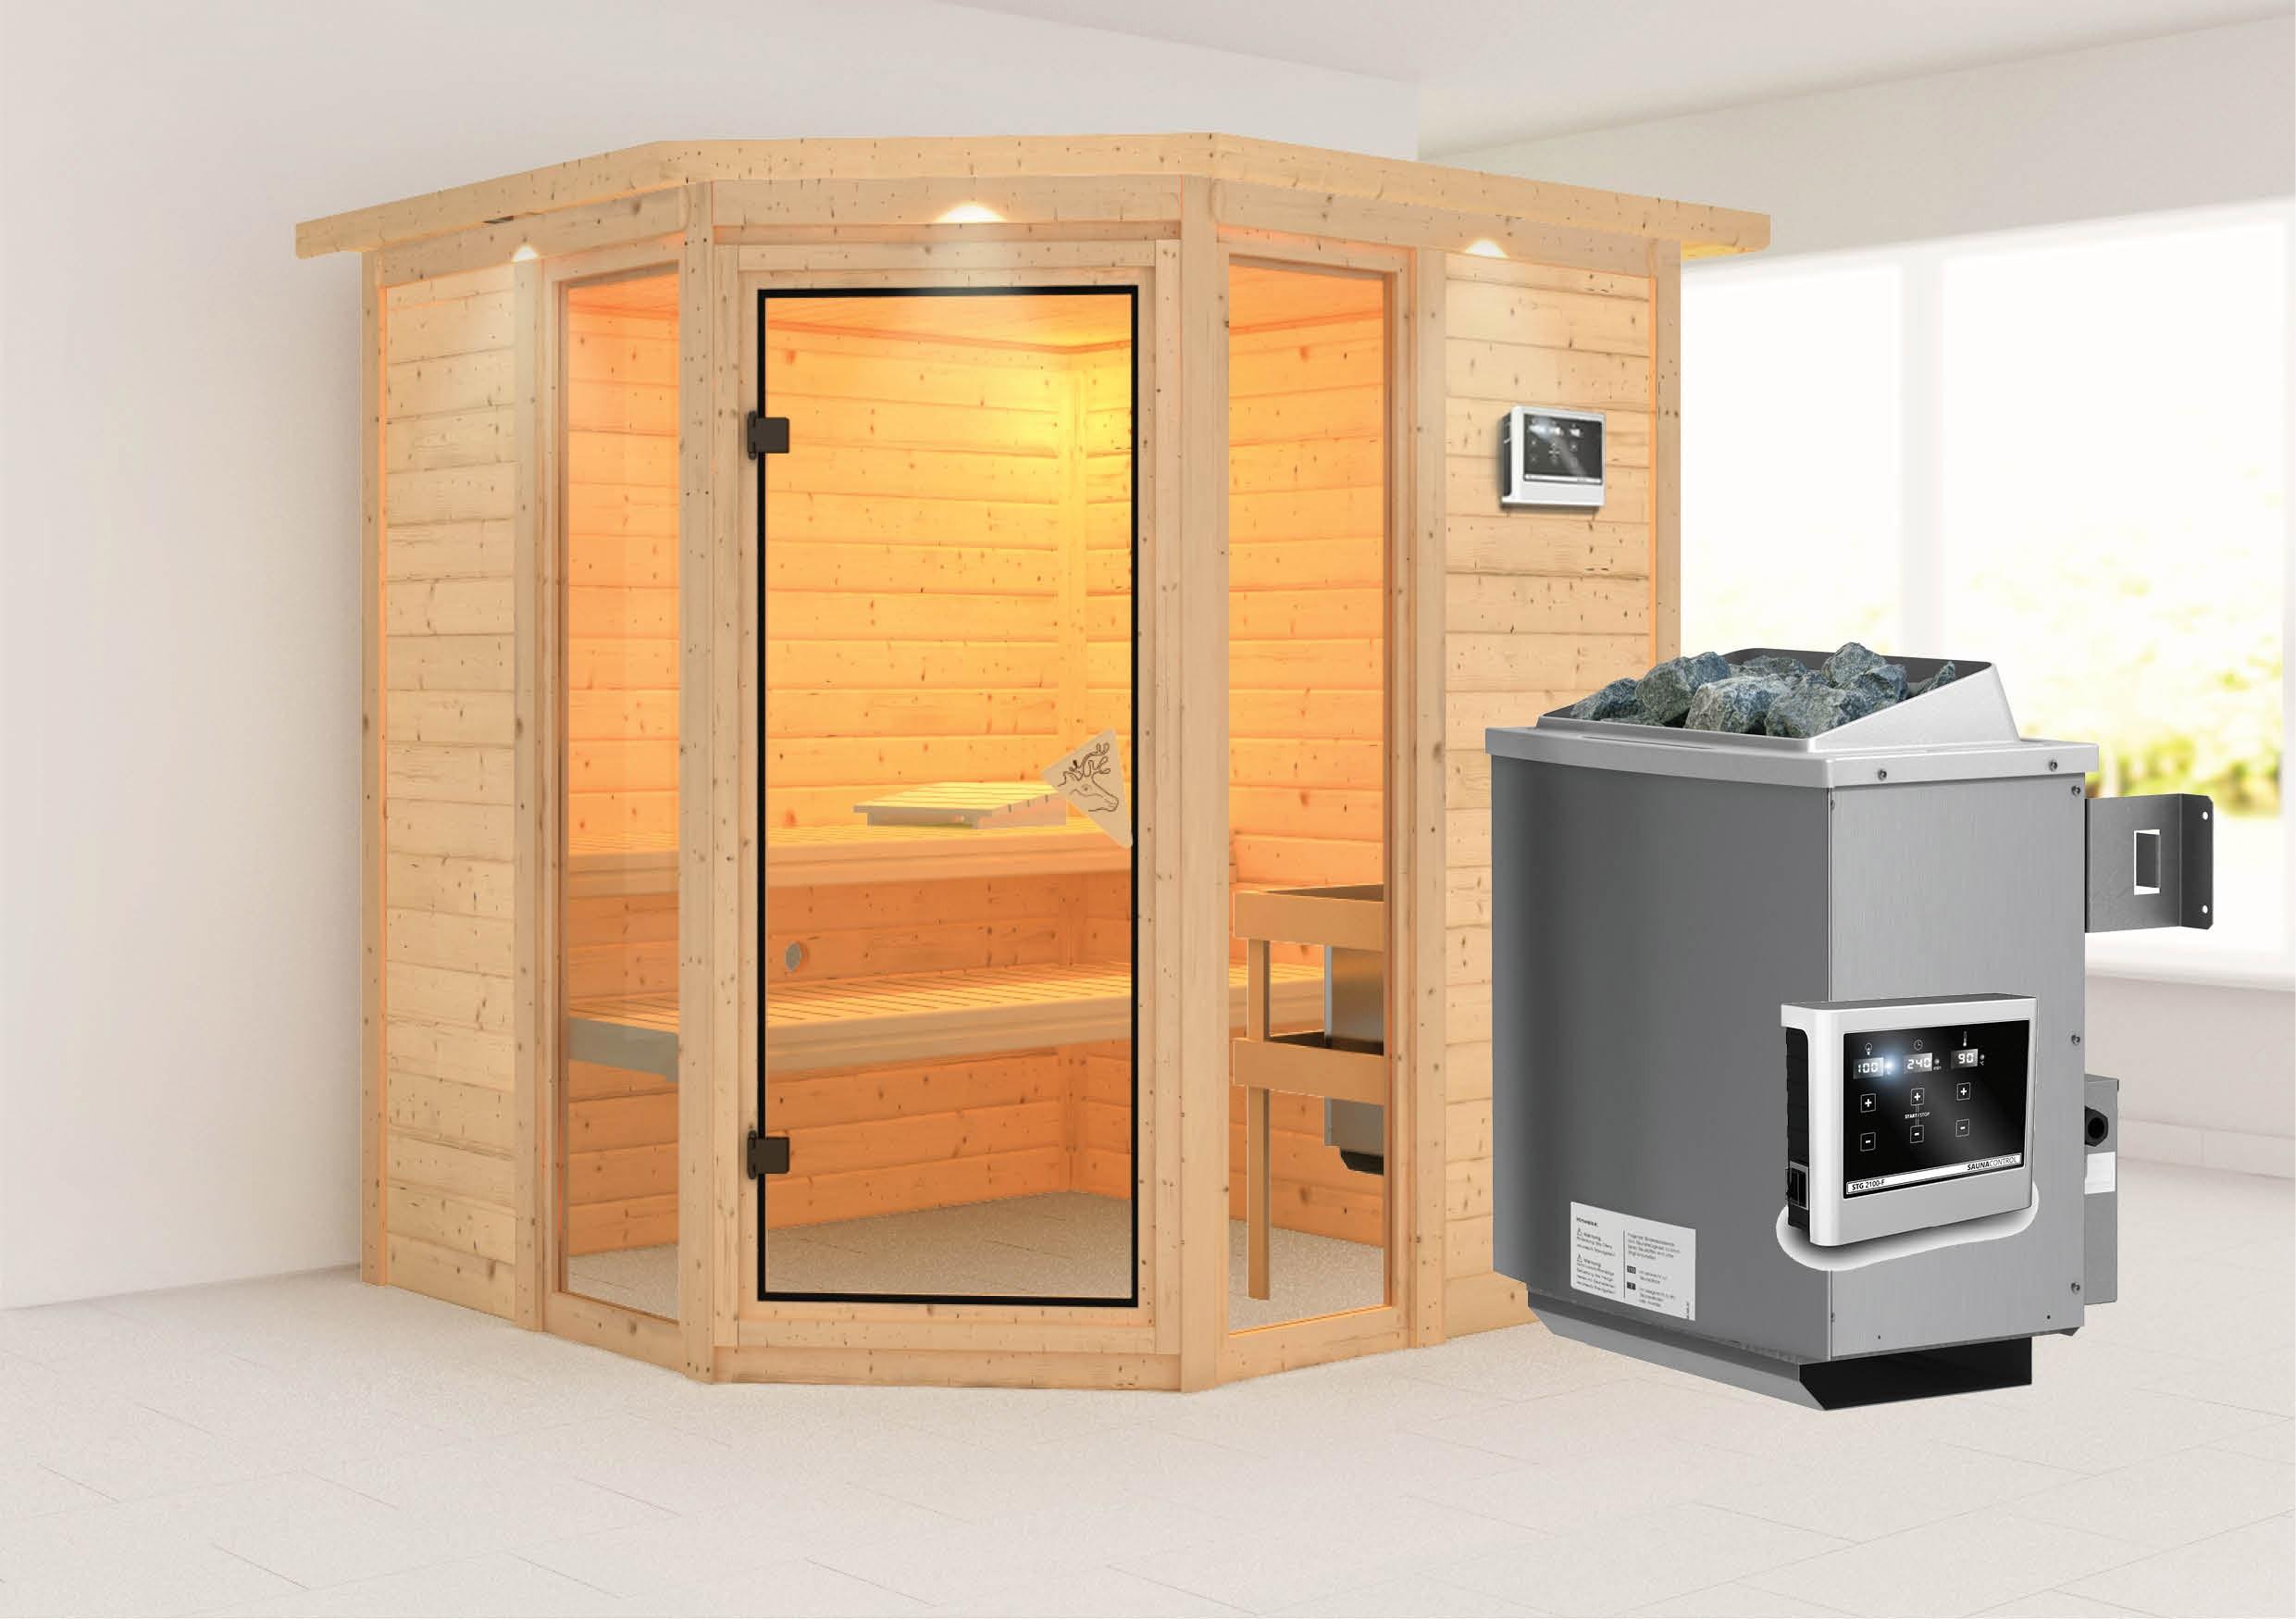 karibu sauna sinai 2 massivholz 40mm mit dachkranz. Black Bedroom Furniture Sets. Home Design Ideas